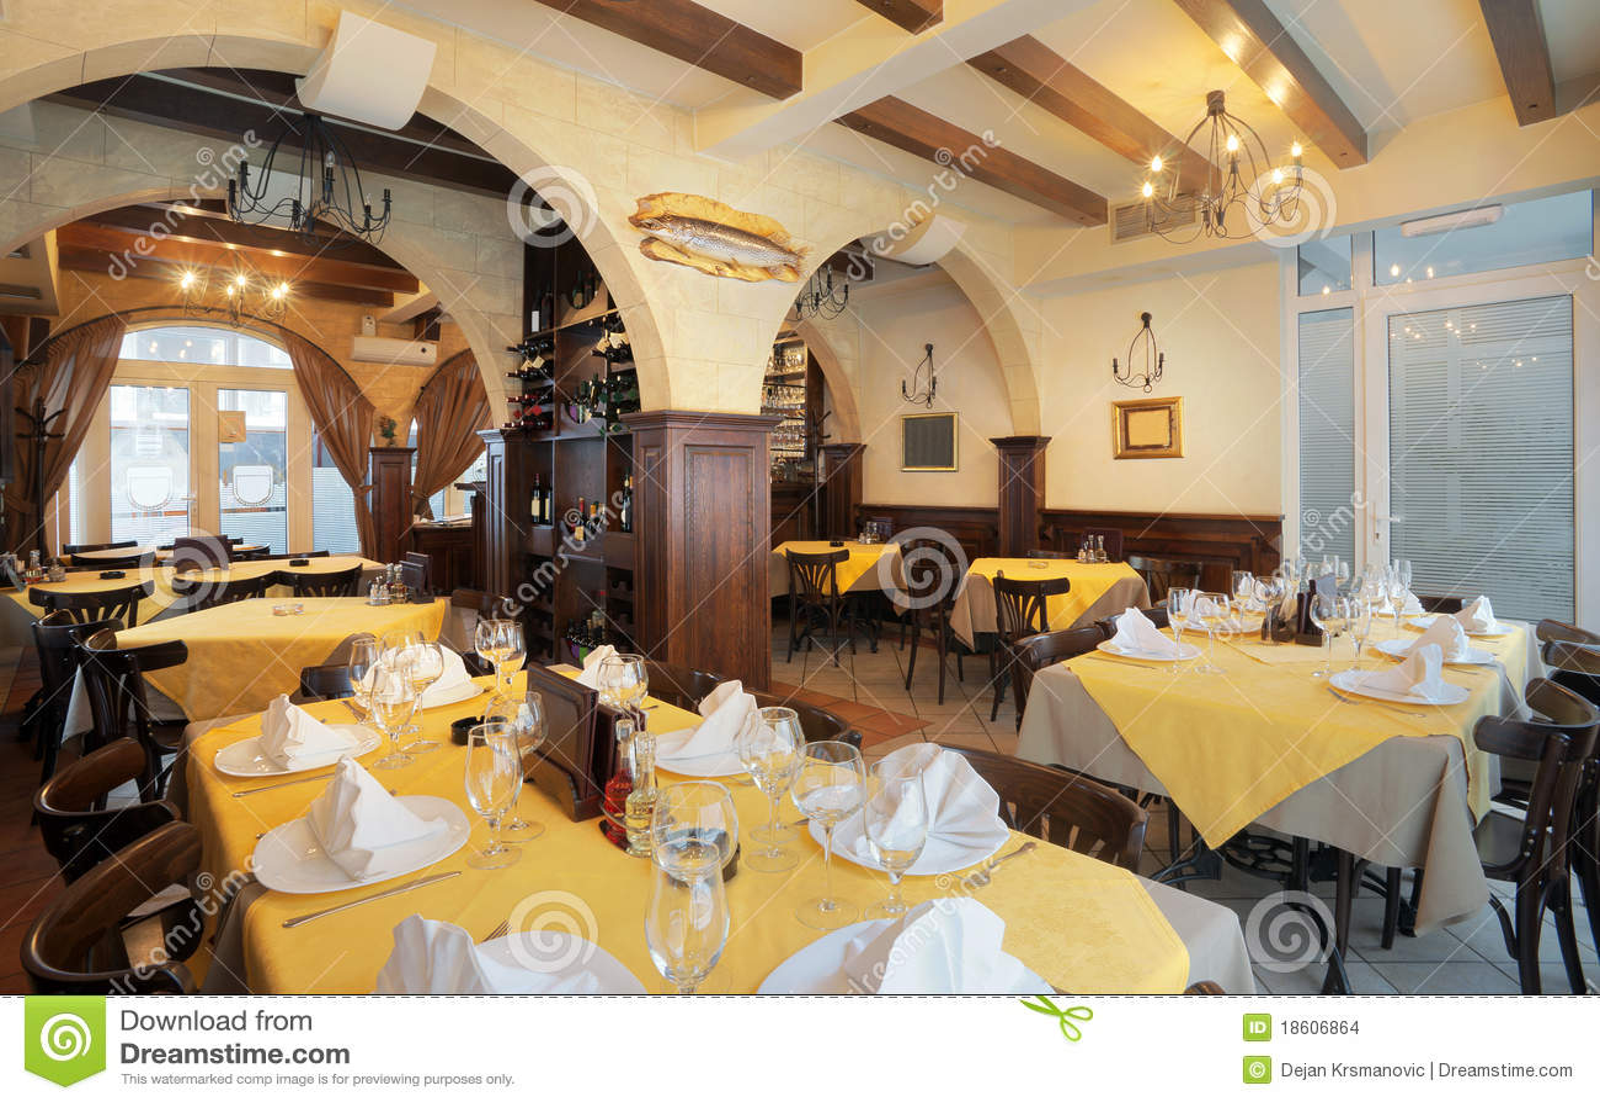 Restaurant interior stock images image